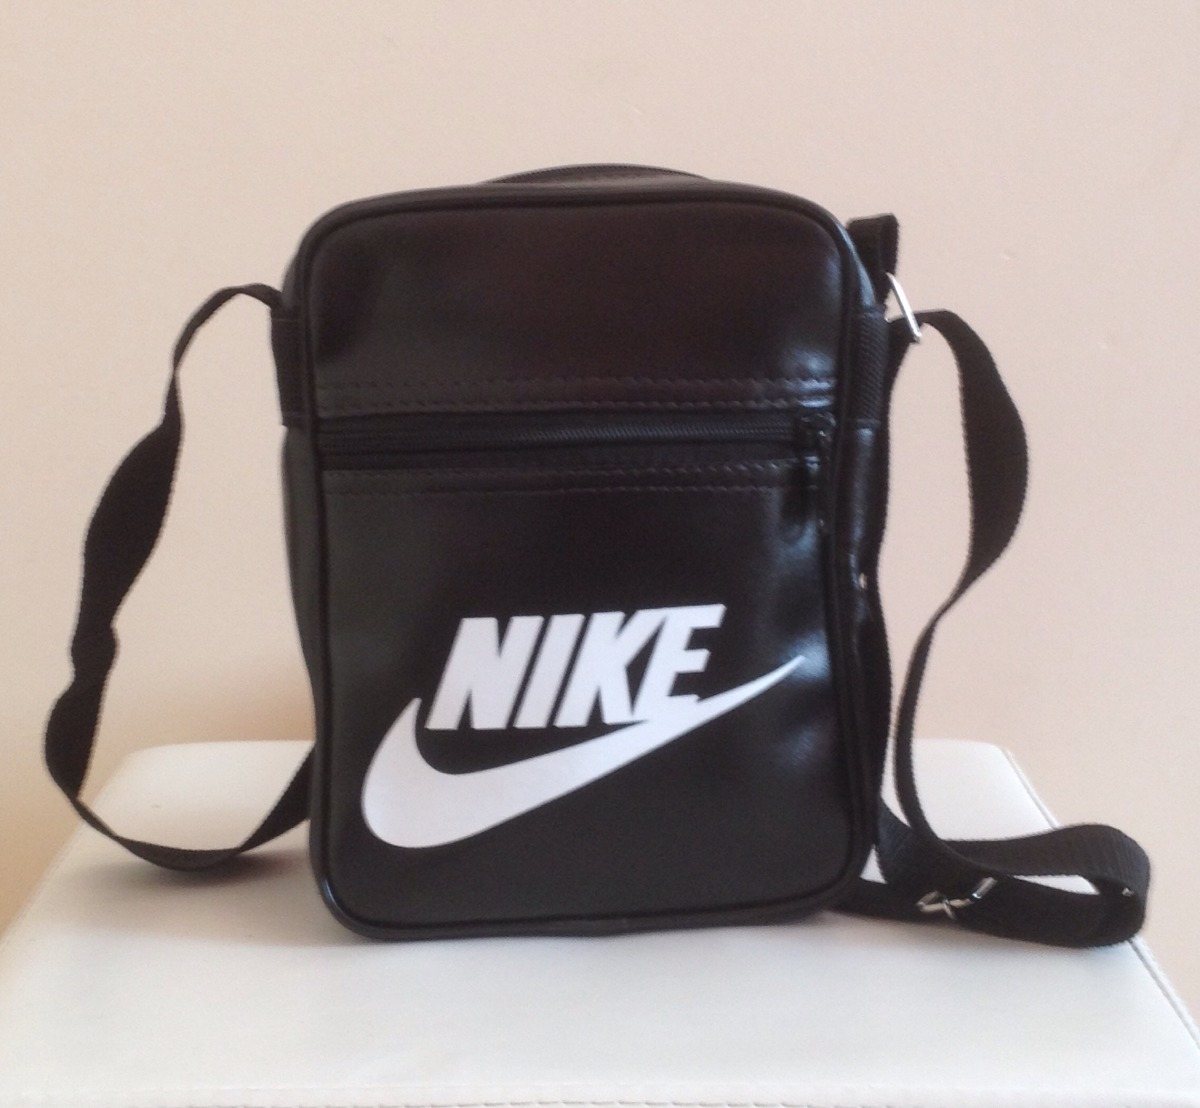 Nike Entrega Bolsa Carteiro SmallPronta 1TKc3lJF